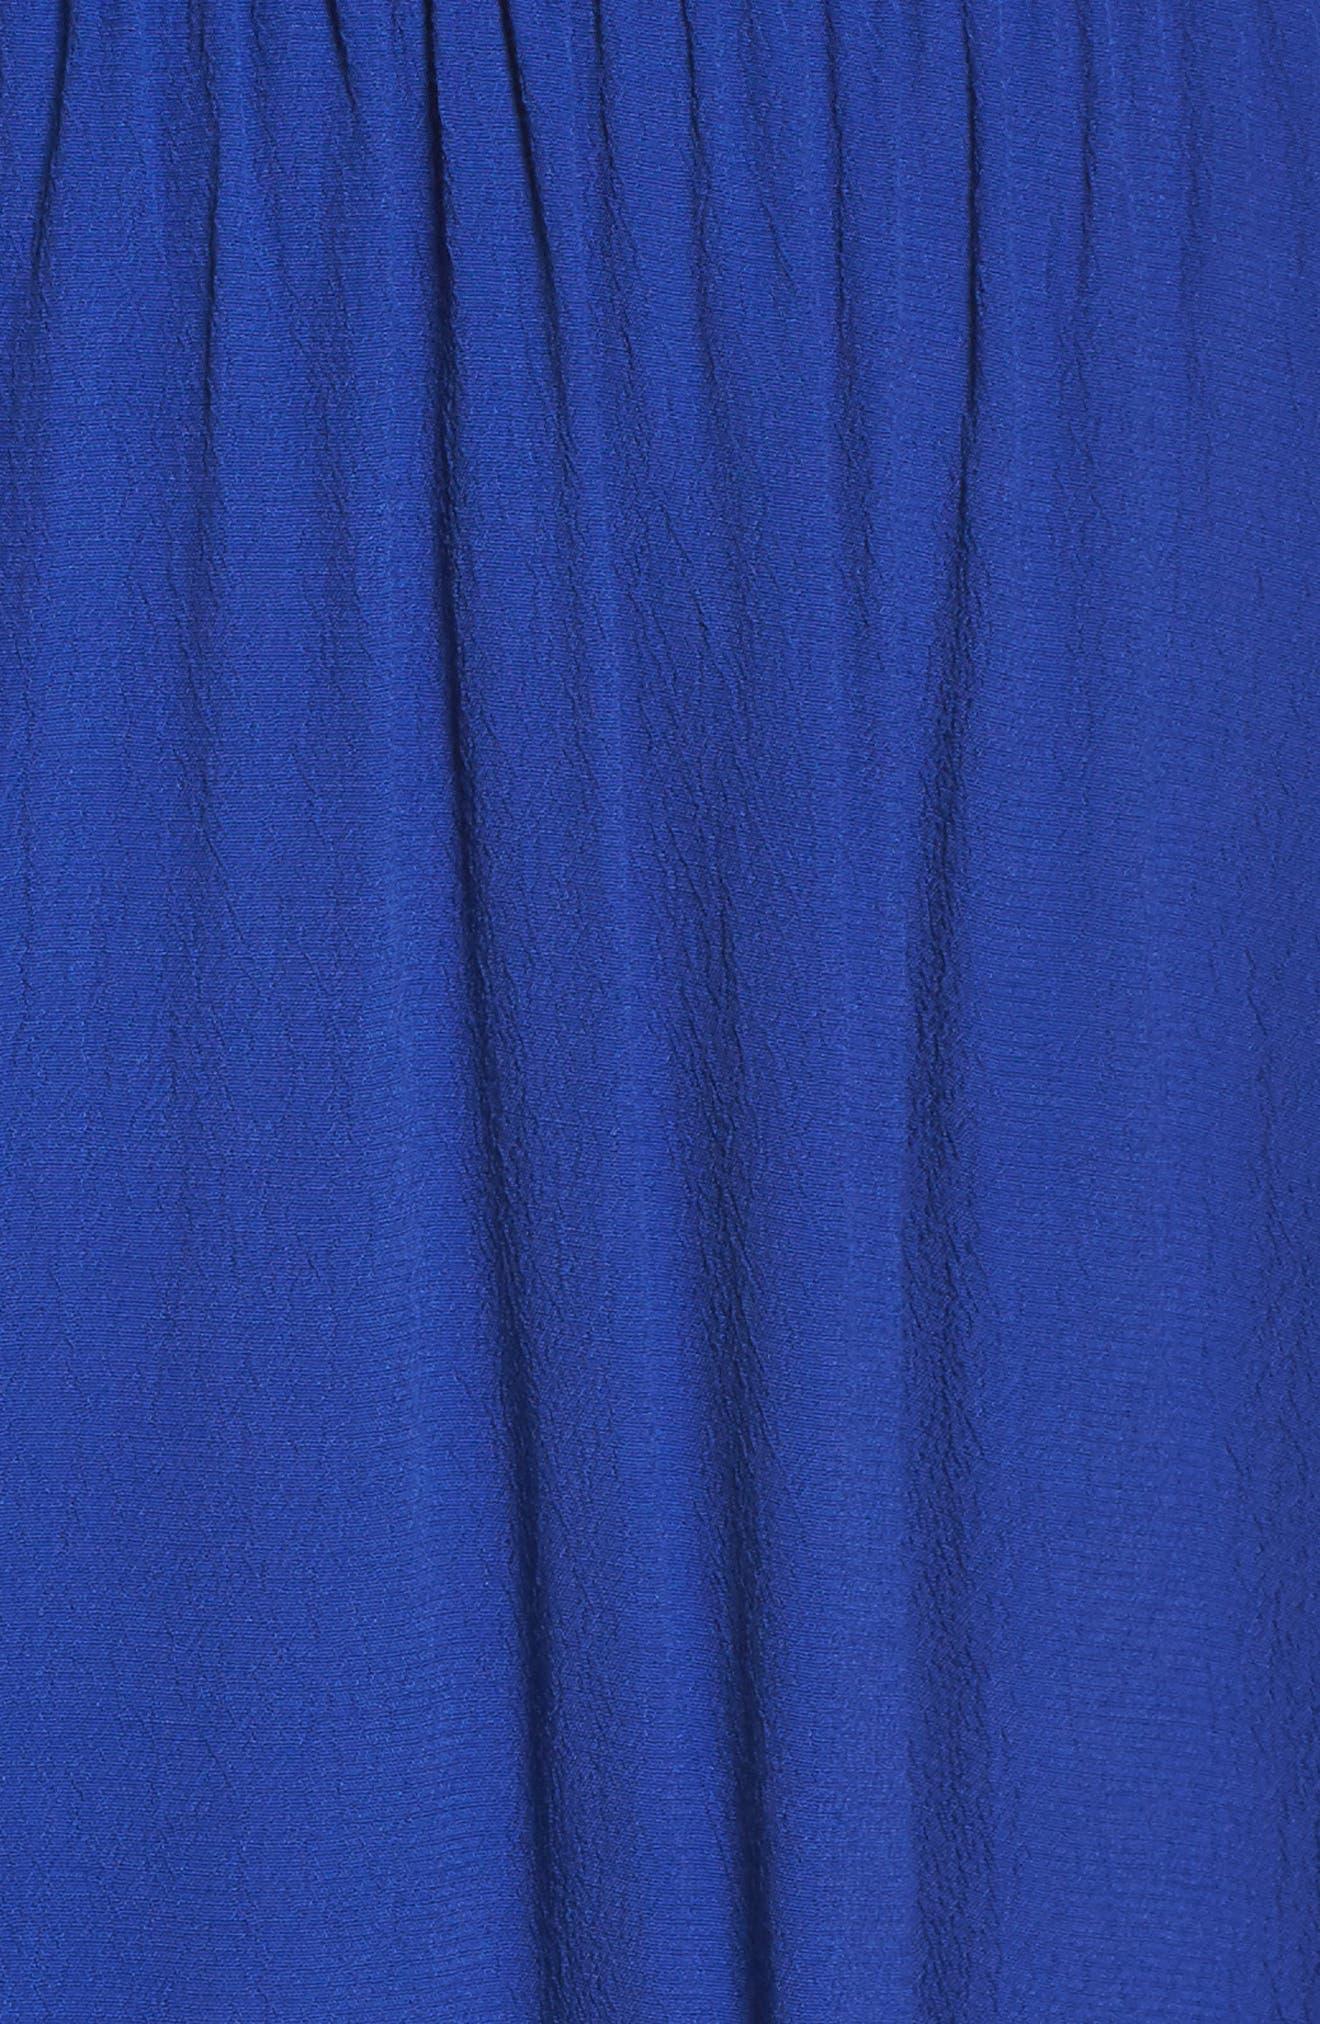 Halter Midi Dress,                             Alternate thumbnail 5, color,                             Blue